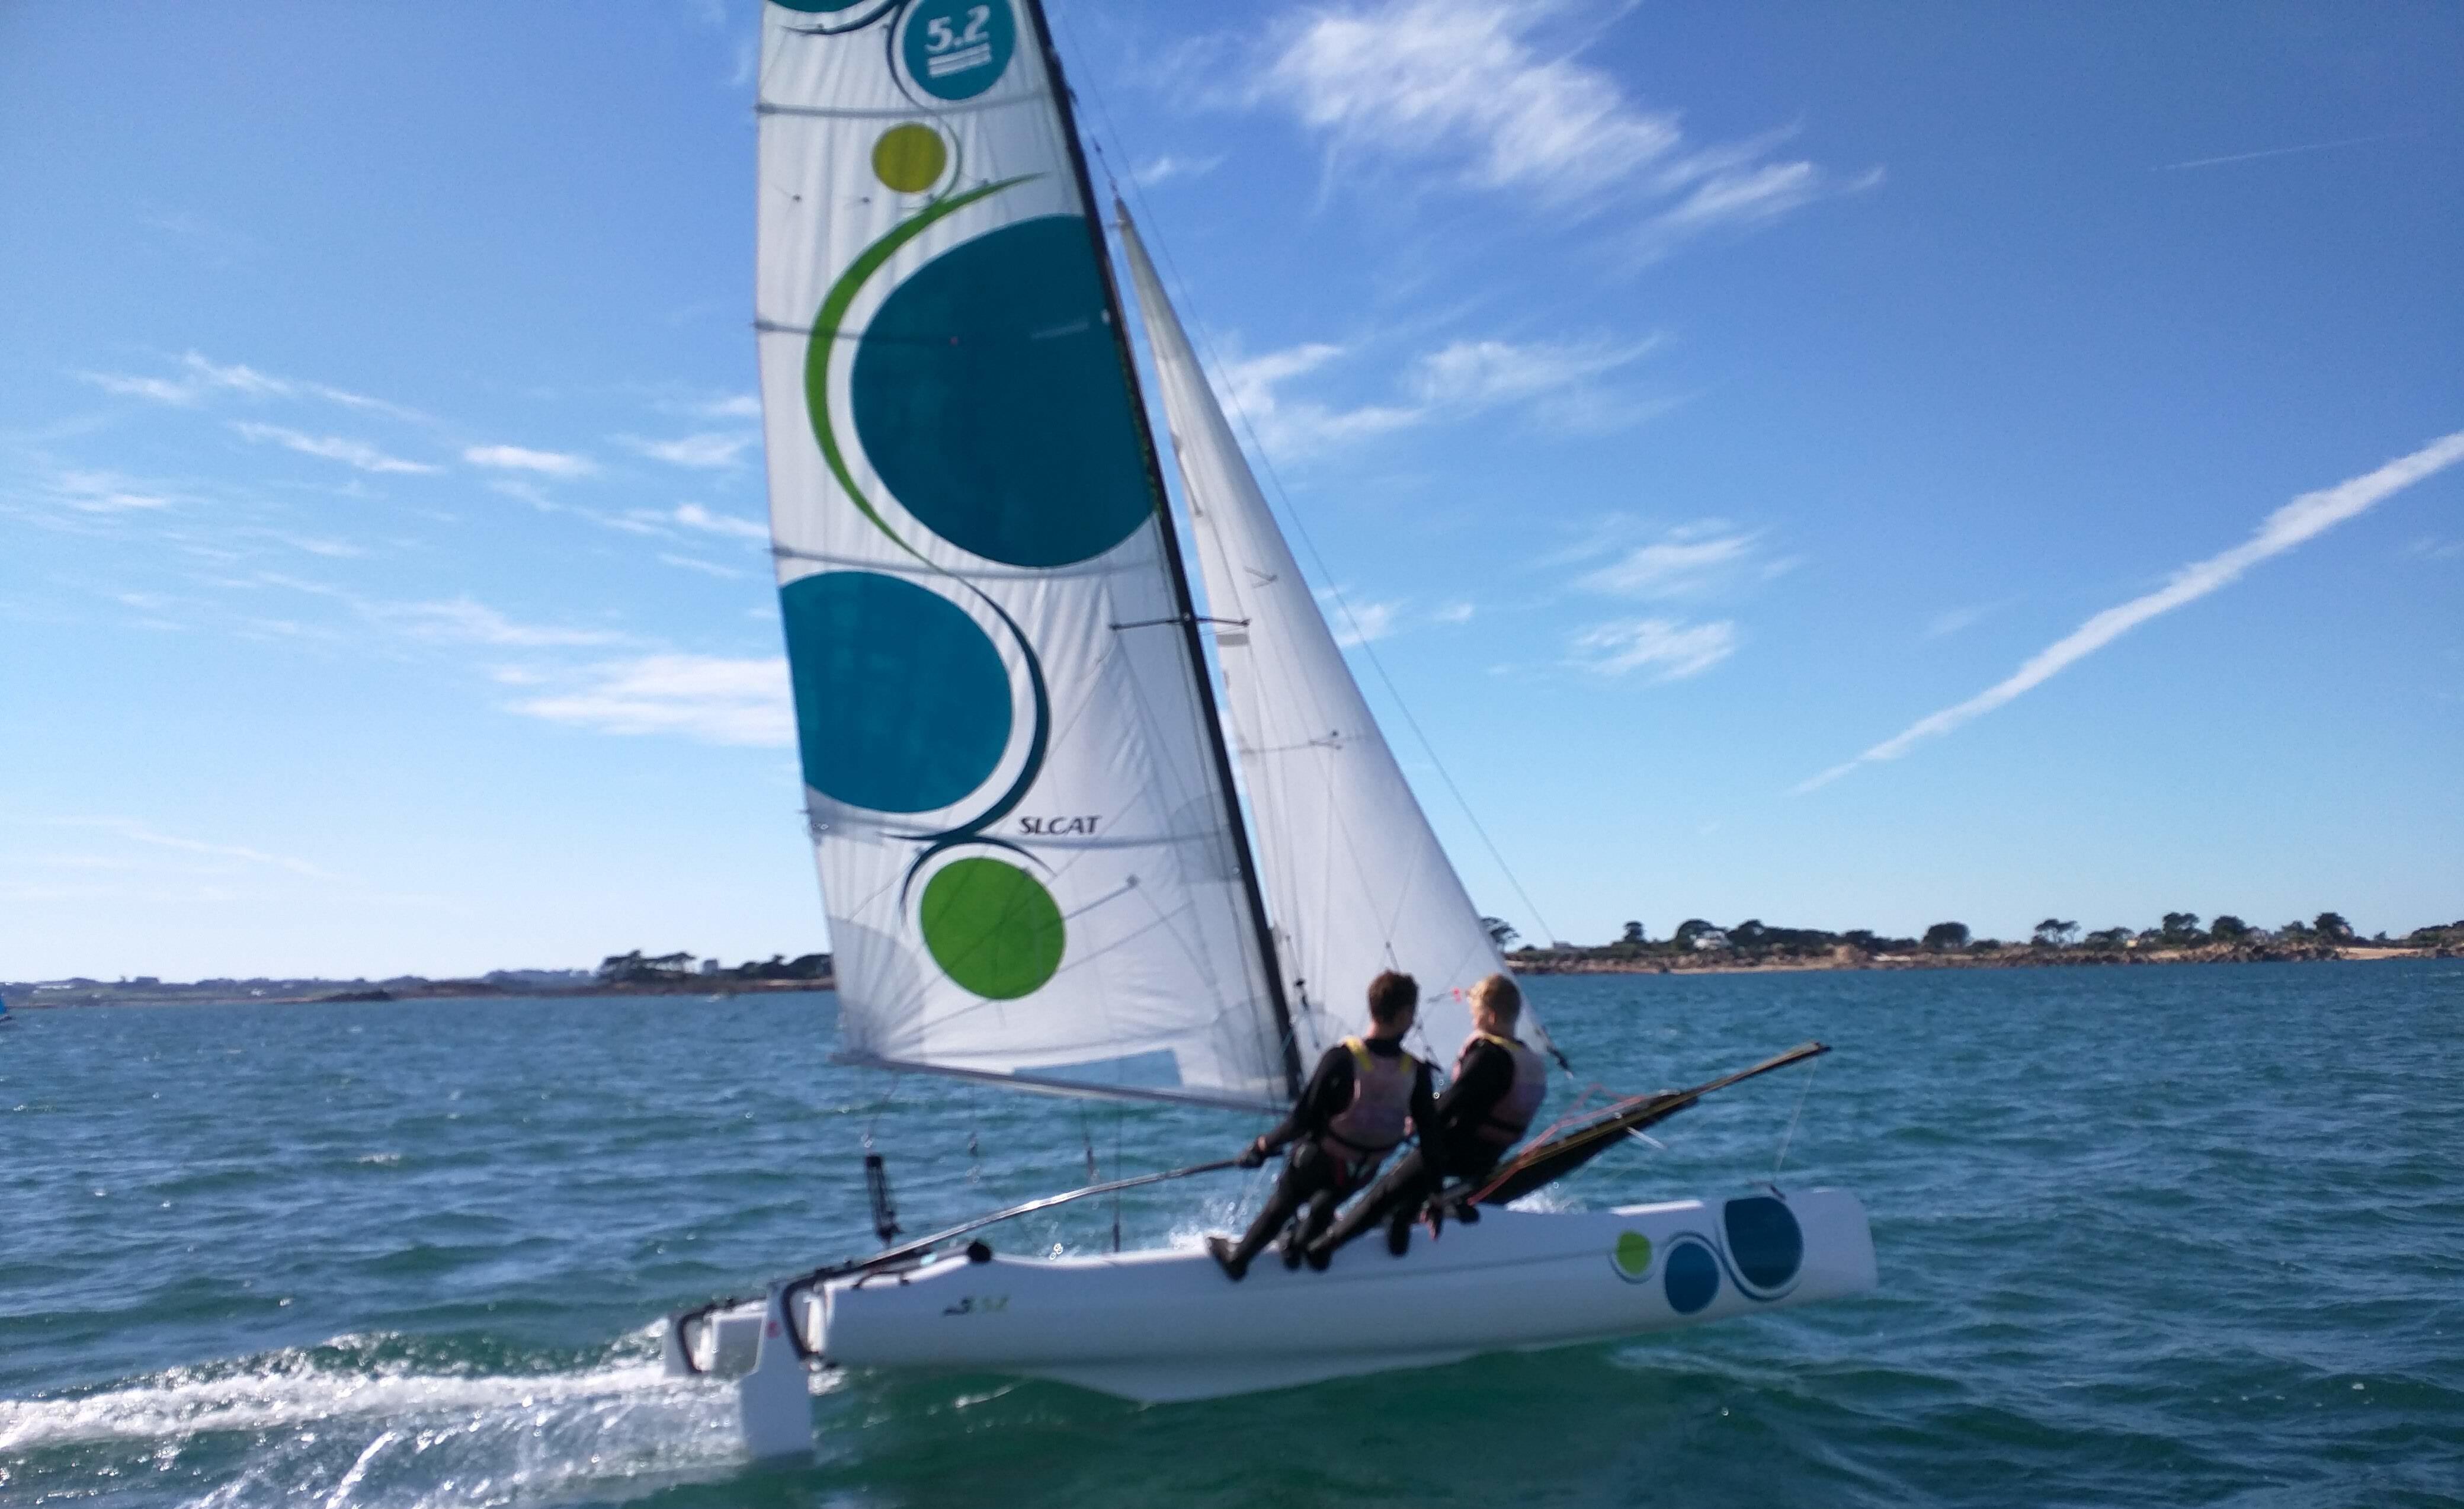 Catamaran adulte ado sport Sl 5.2 callot